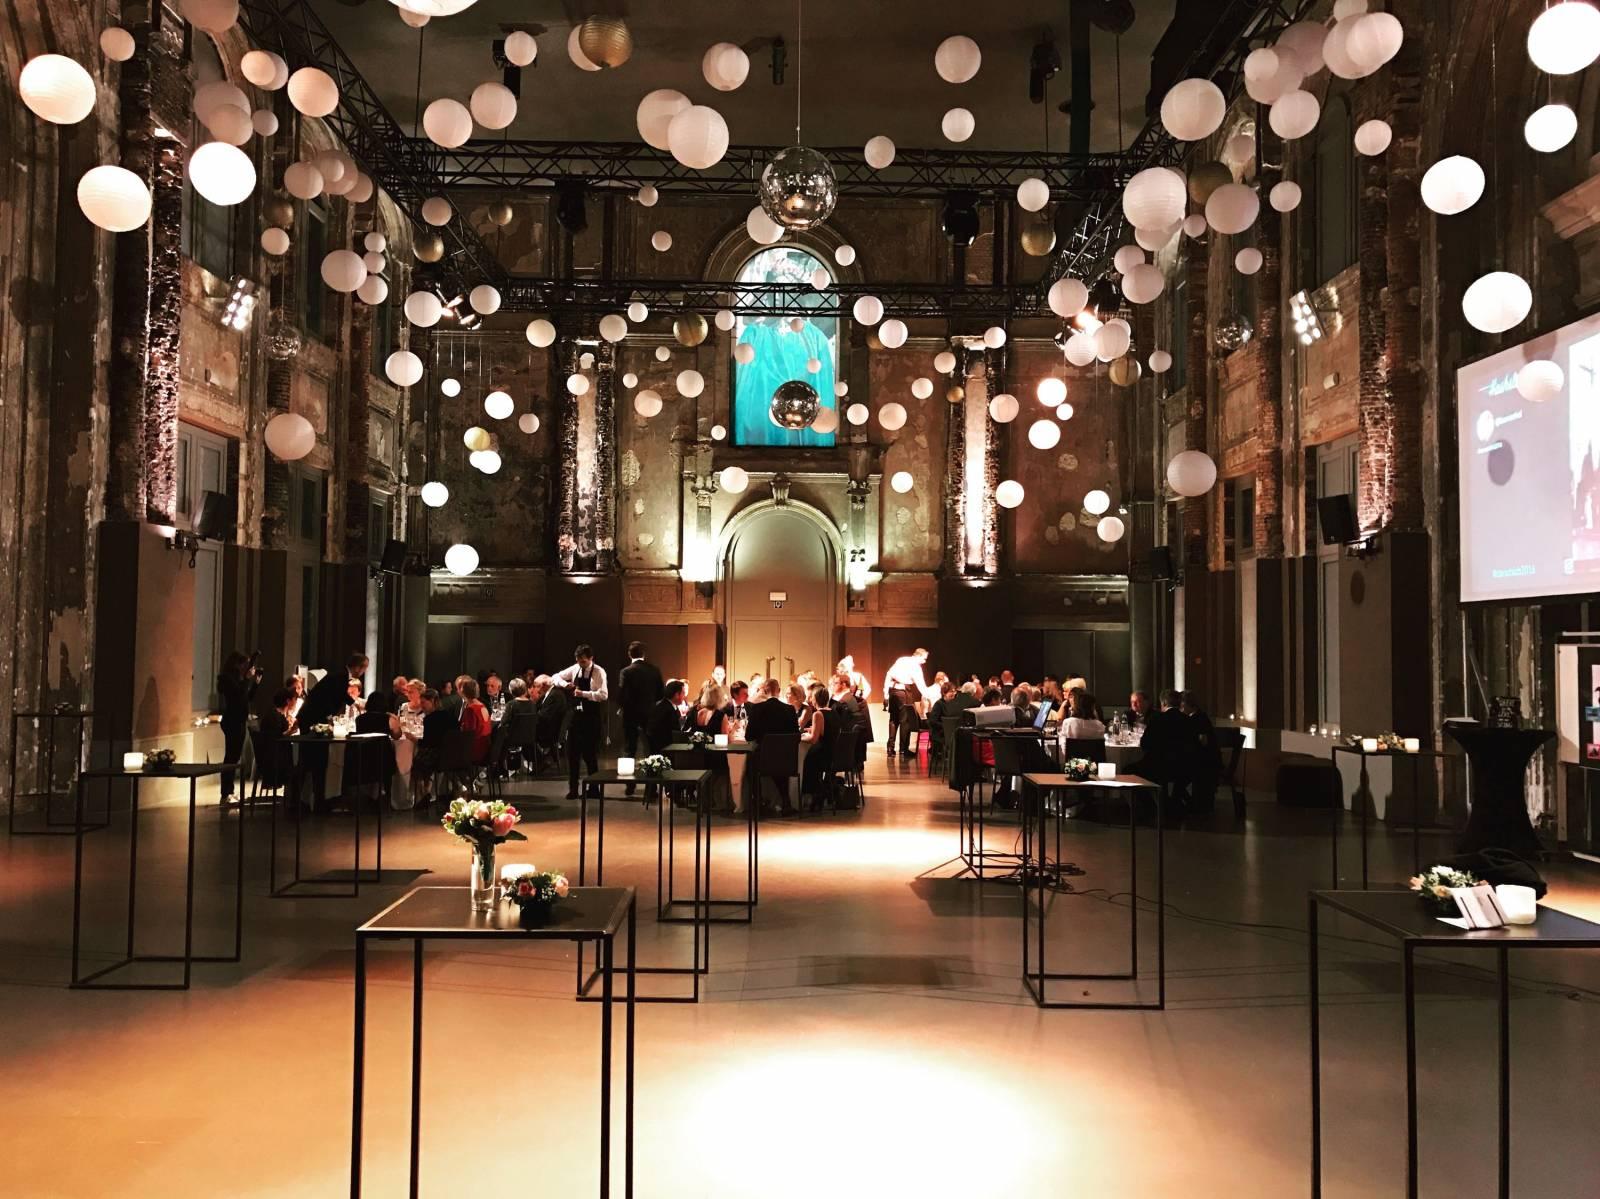 Zaal AthenA - Feestzaal - Trouwzaal - Antwerpen - House of Weddings - 17